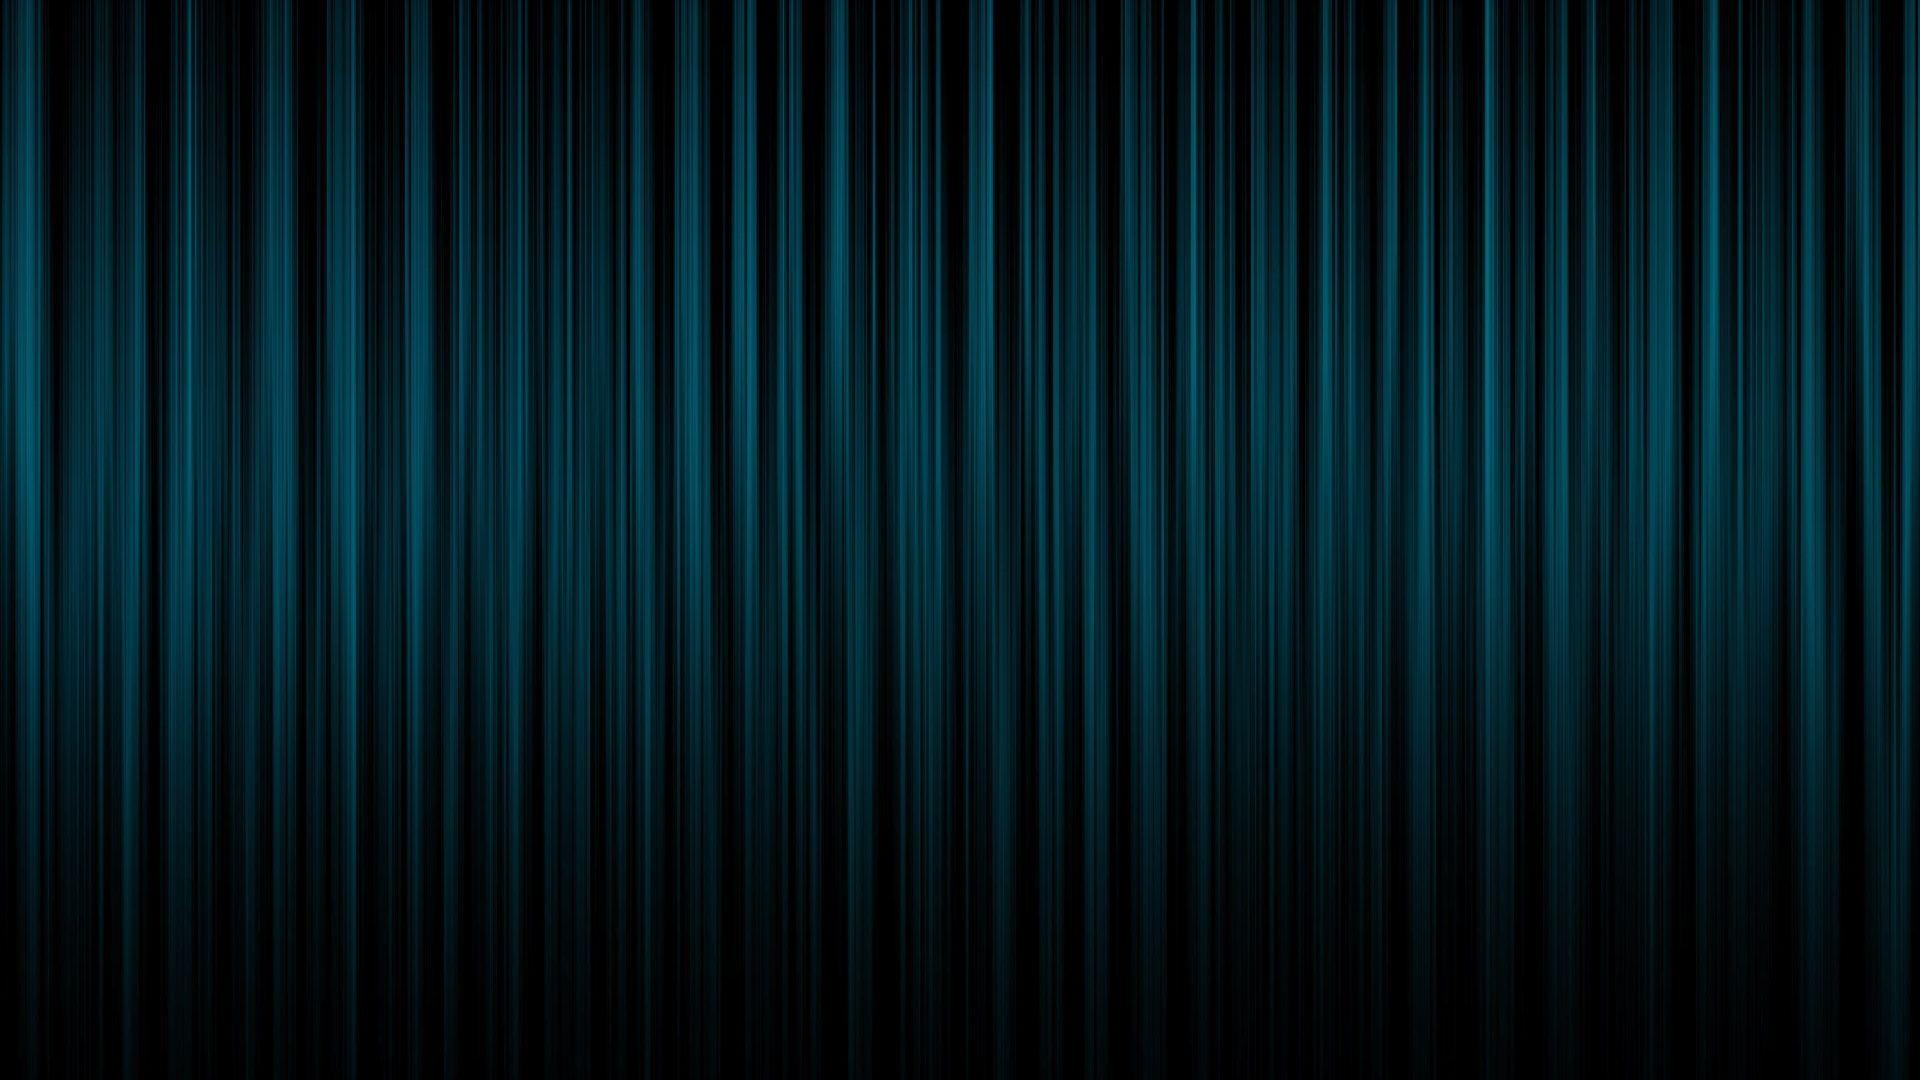 Download Wallpaper 1920x1080 Stripes Vertical White Background Full Hd 1080p Hd Background Black Hd Wallpaper Black Wallpaper Wallpaper